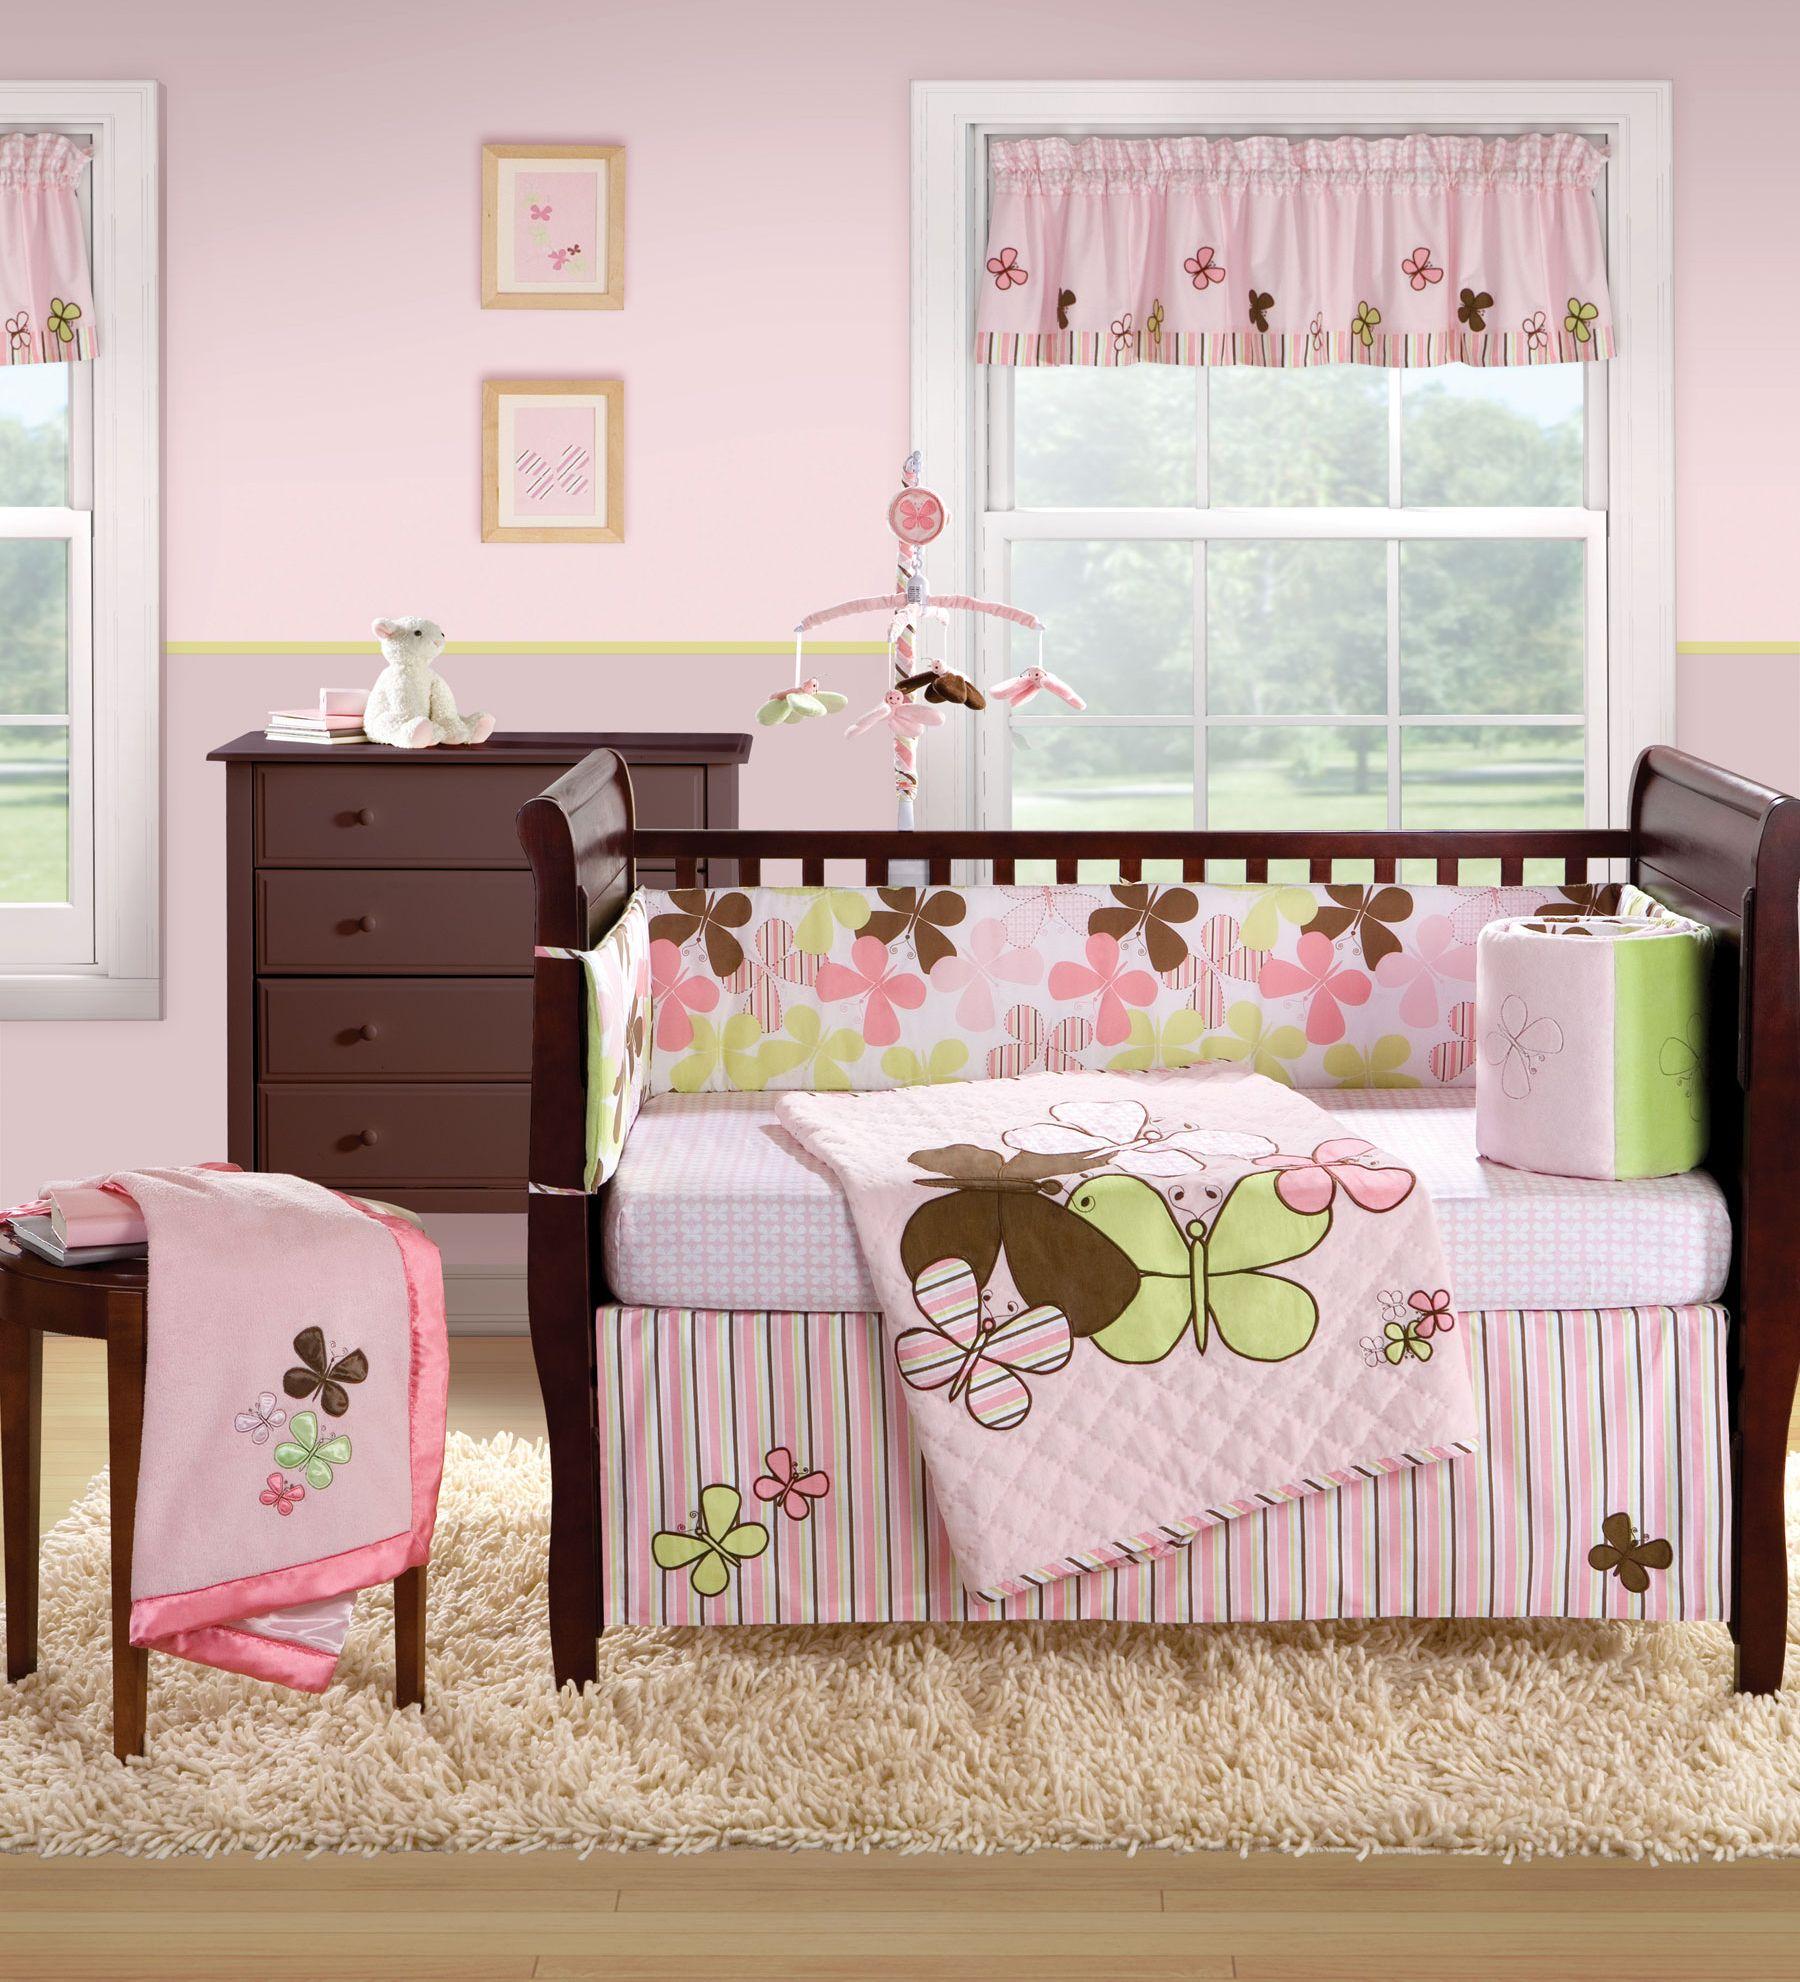 Banana Fish Mod Erfly Baby Crib Bedding Set And Nursery Accessory Items Free Shipping